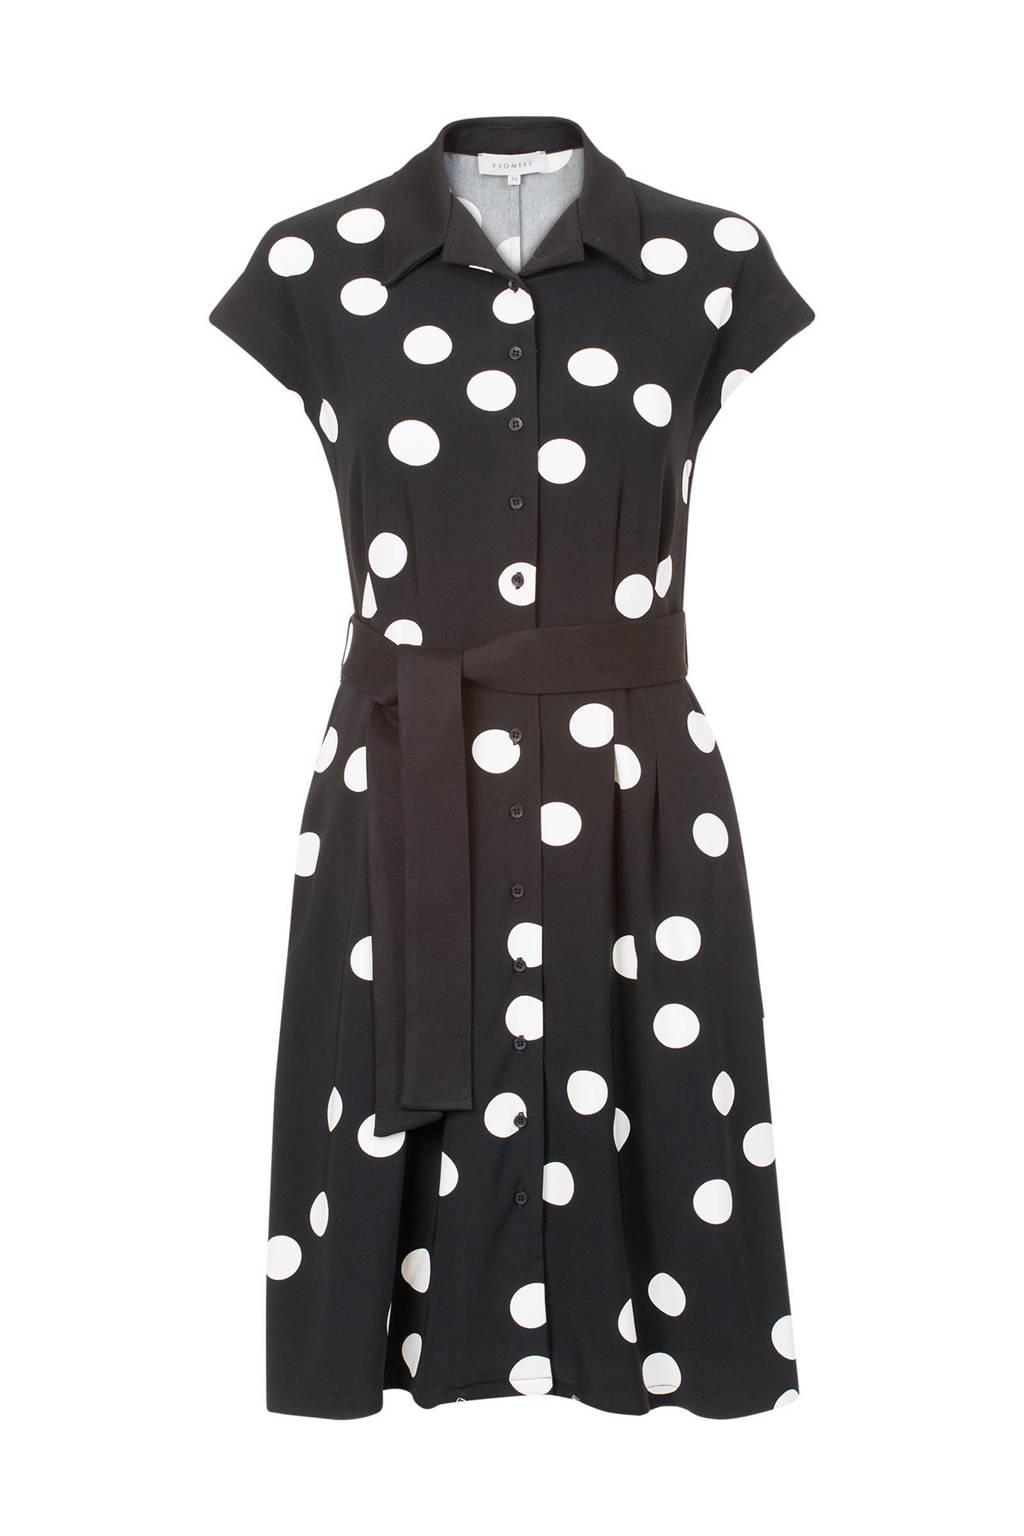 d1707f9ac82292 Promiss jurk met stippen dessin